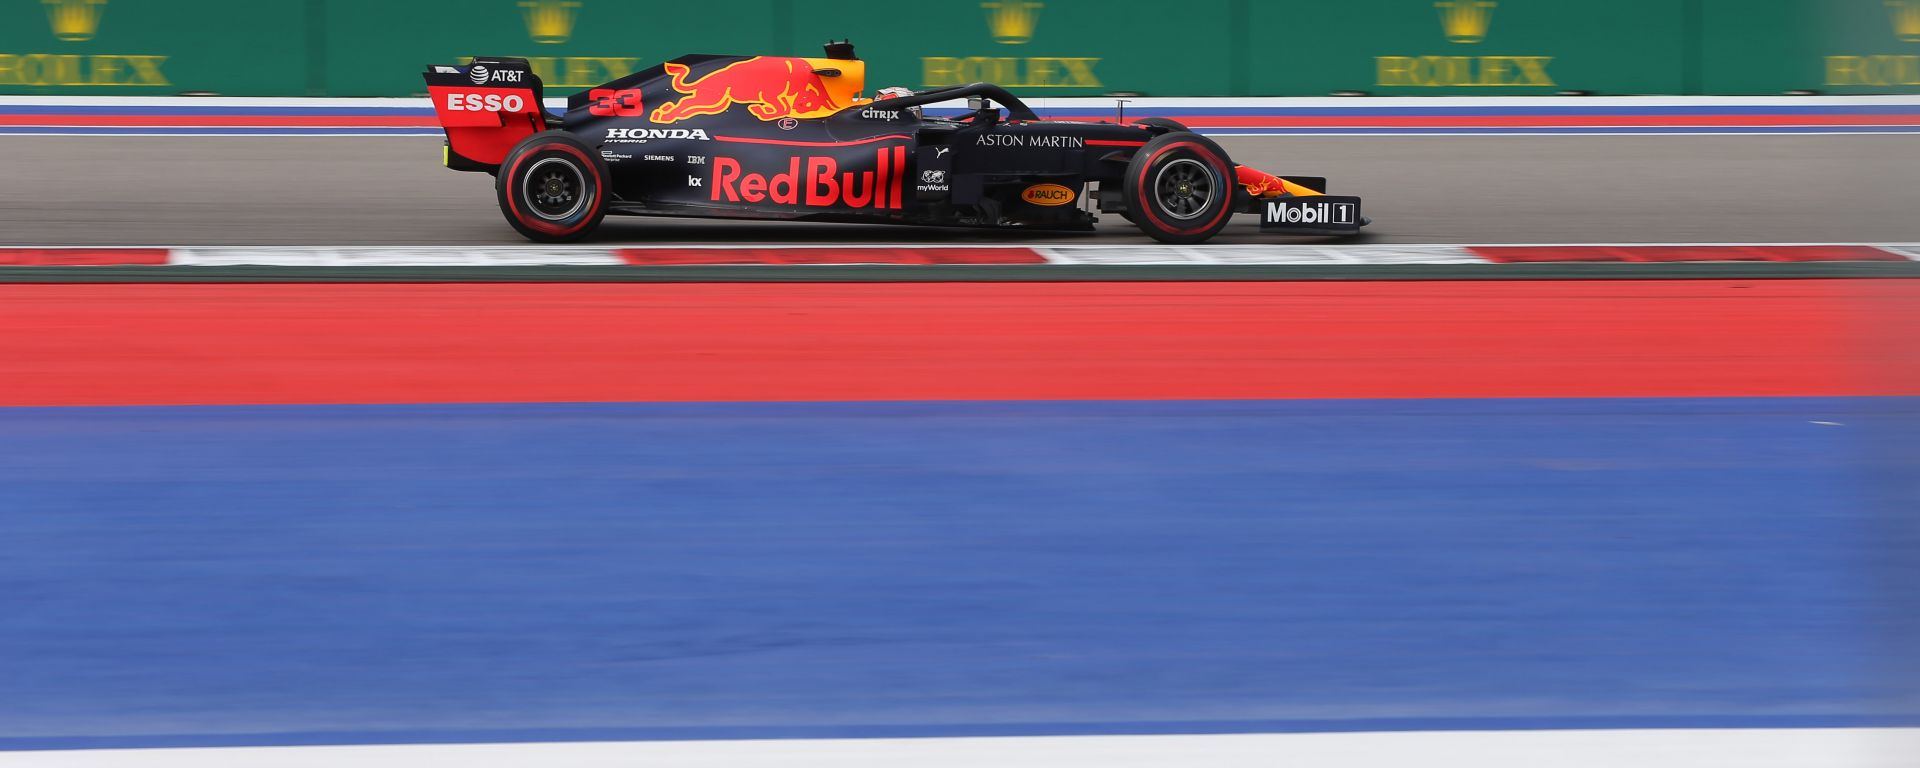 F1 GP Russia 2019, Sochi: Max Verstappen (Red Bull)